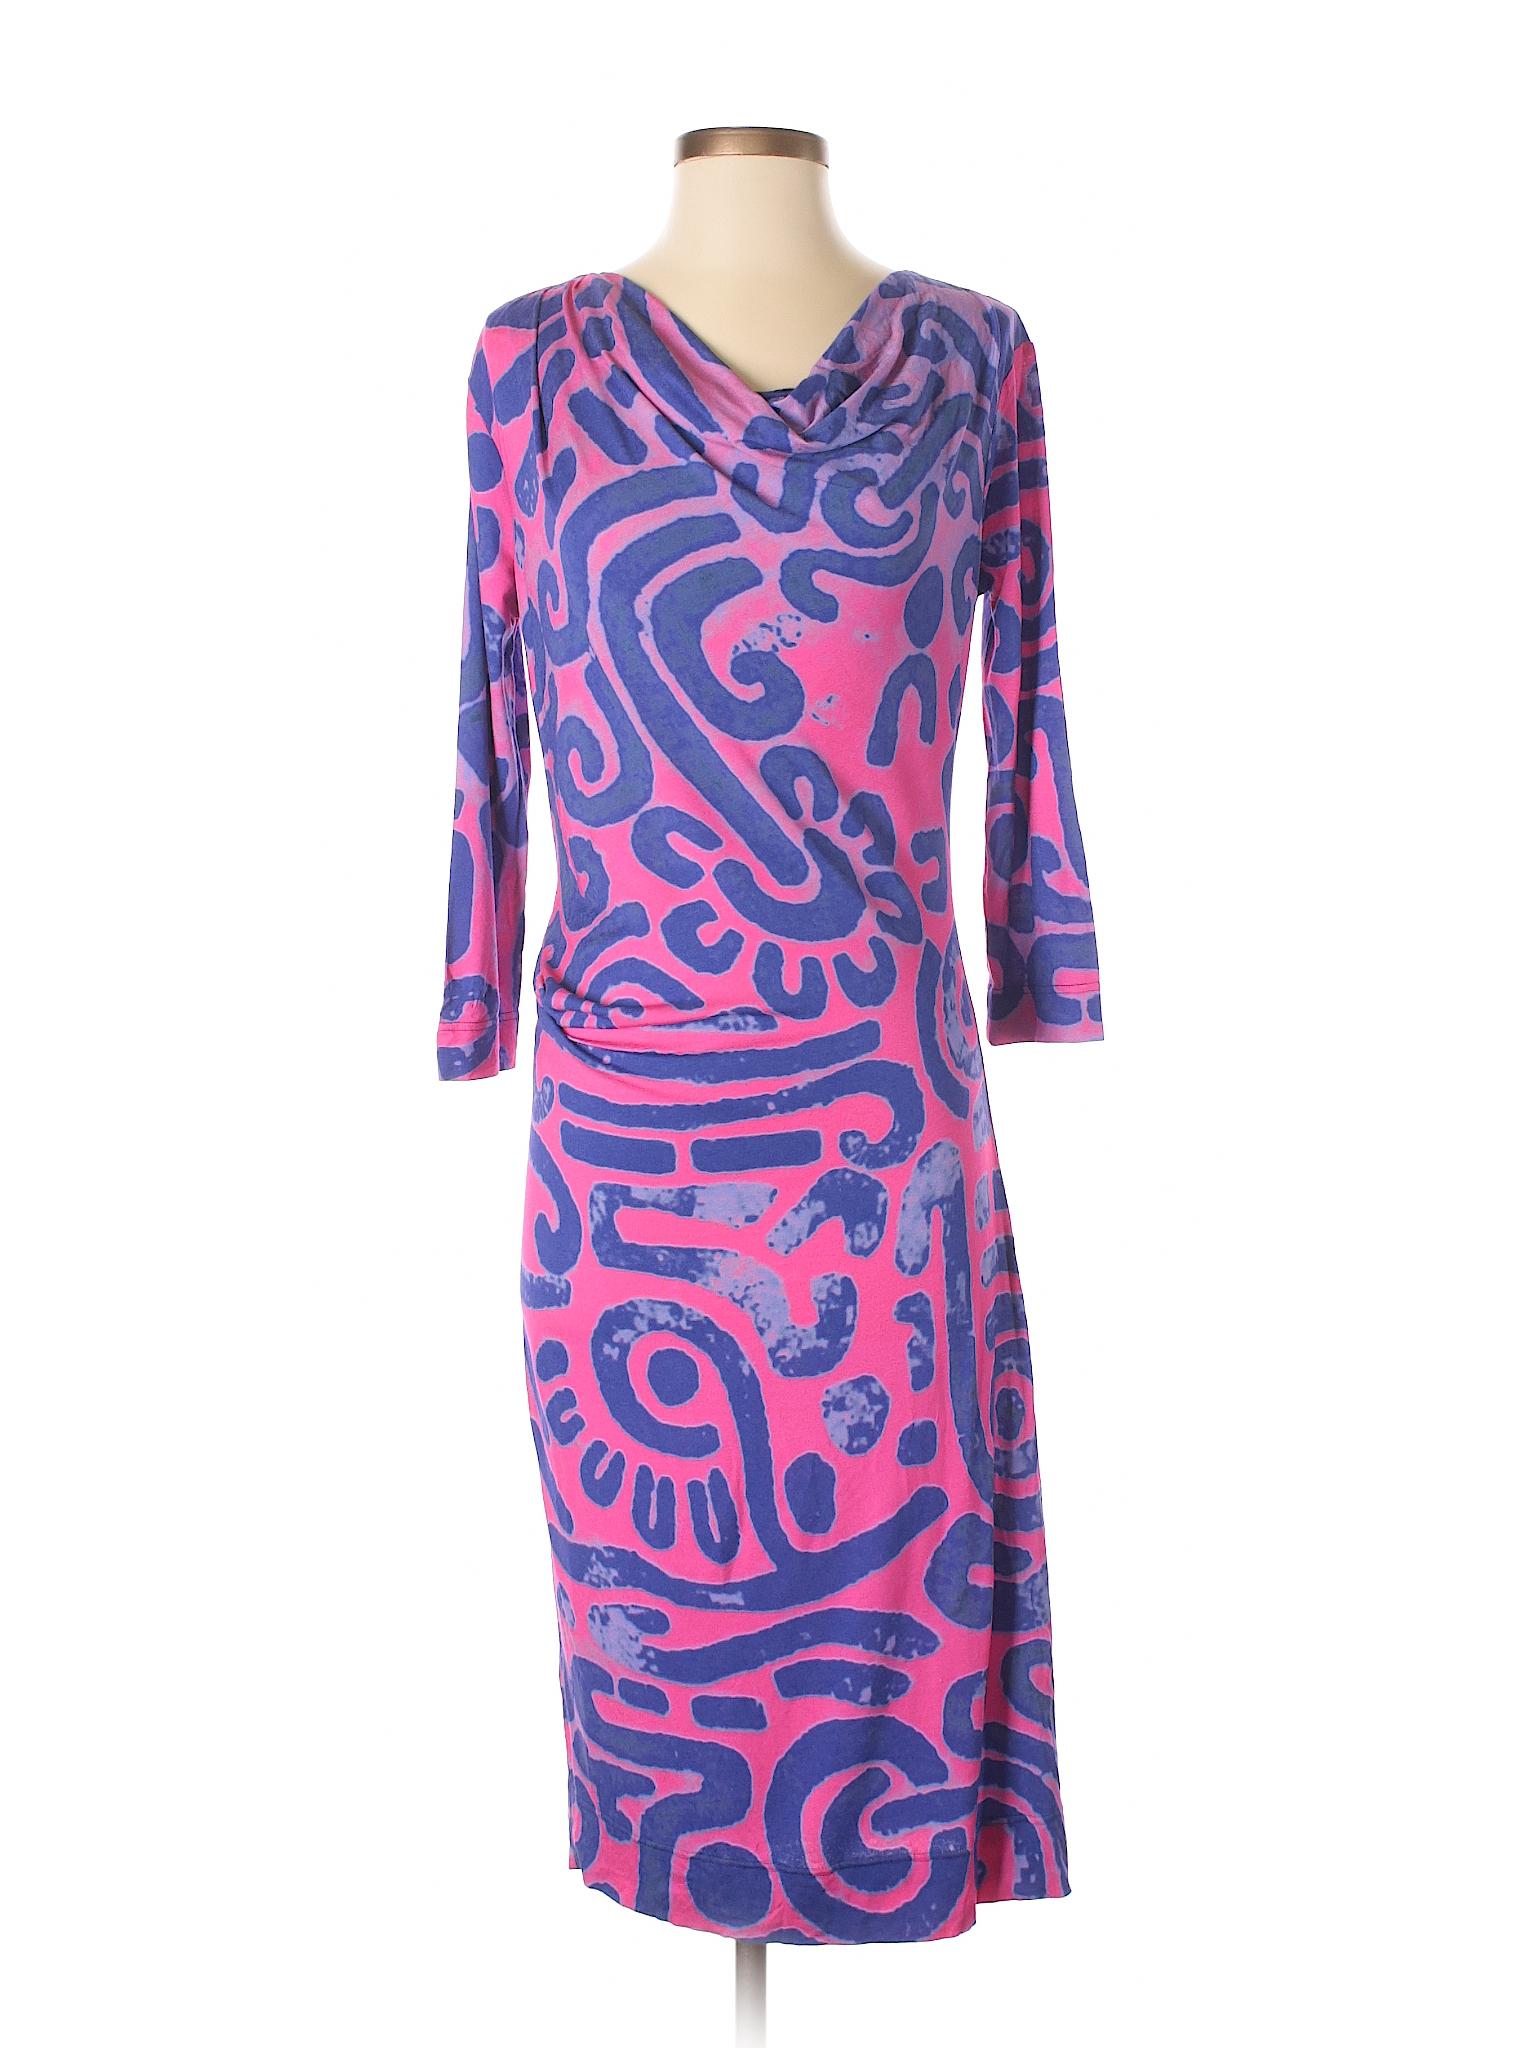 Dress Boutique Casual Vivienne Westwood Anglomania winter qwwgOXZR